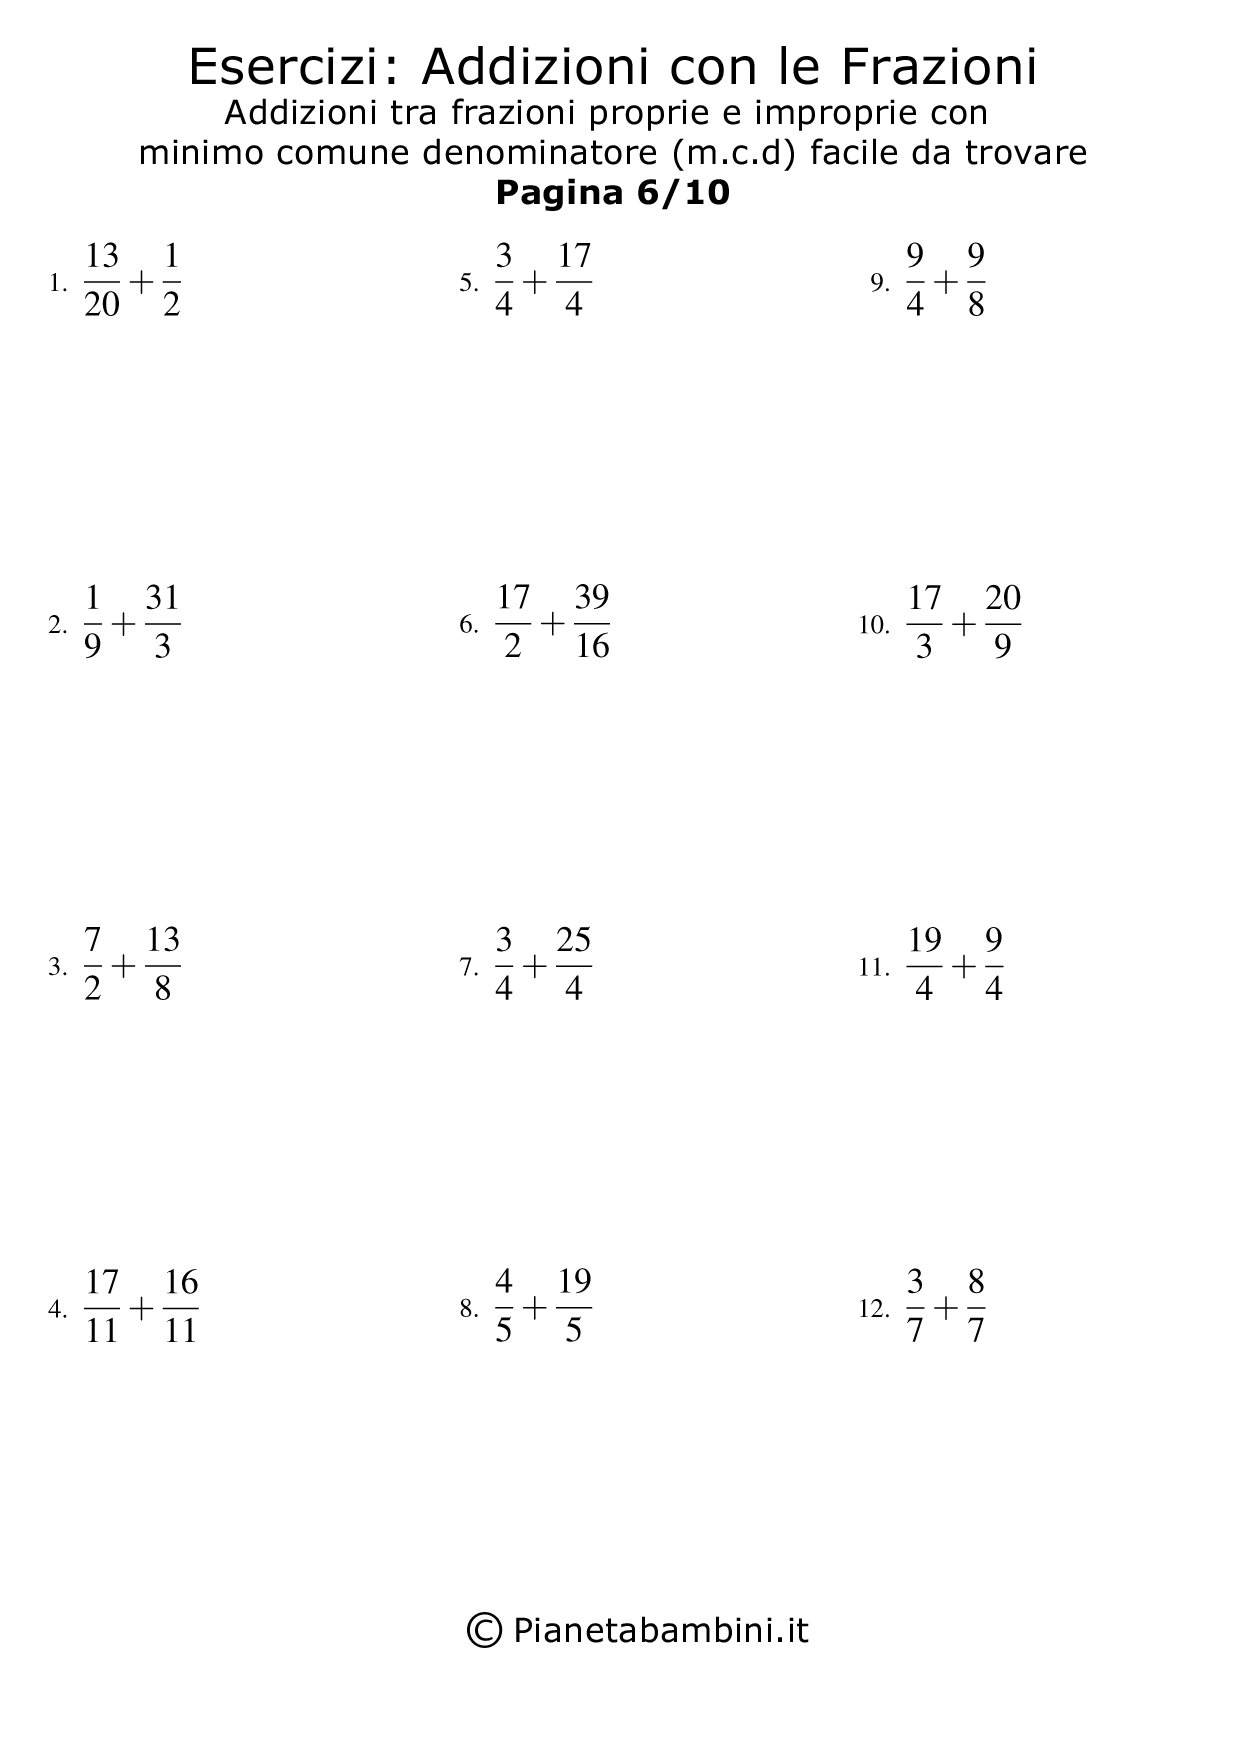 Frazioni-Prorpie-Improprie-m.c.d-Facile_06